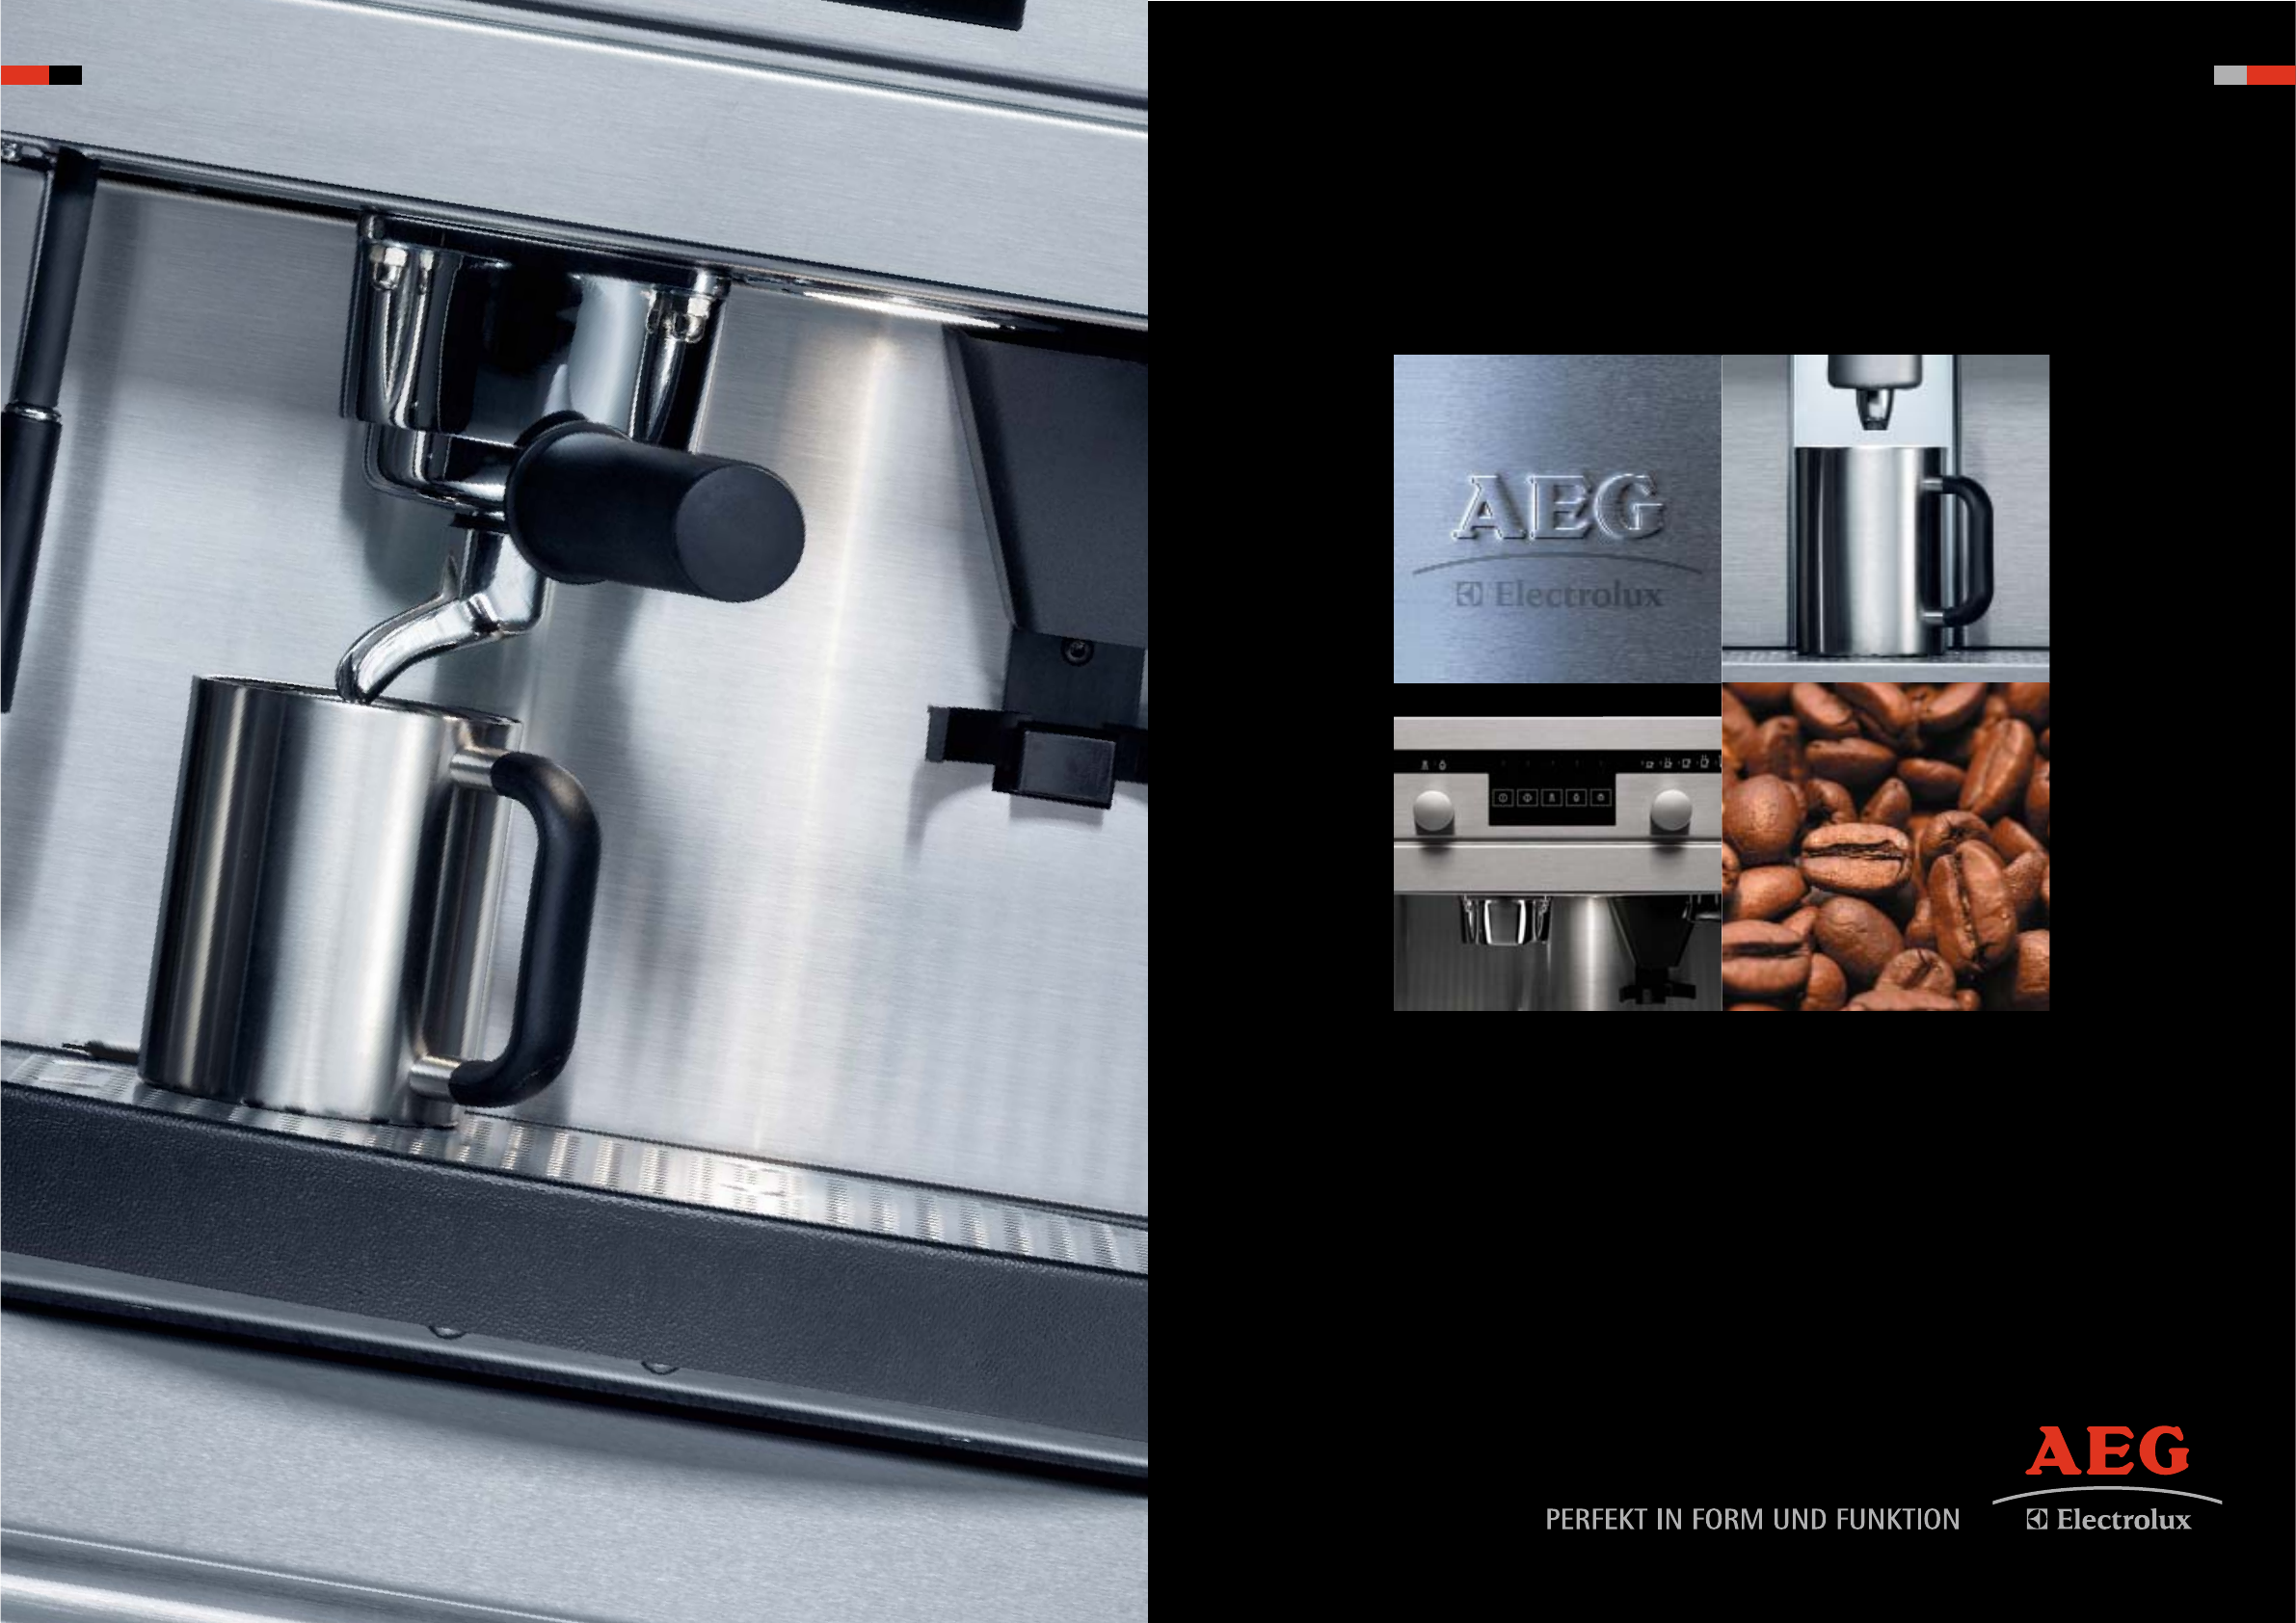 Aeg Coffee Machines Users Manual 48888 Mg Built In Brochure 2008